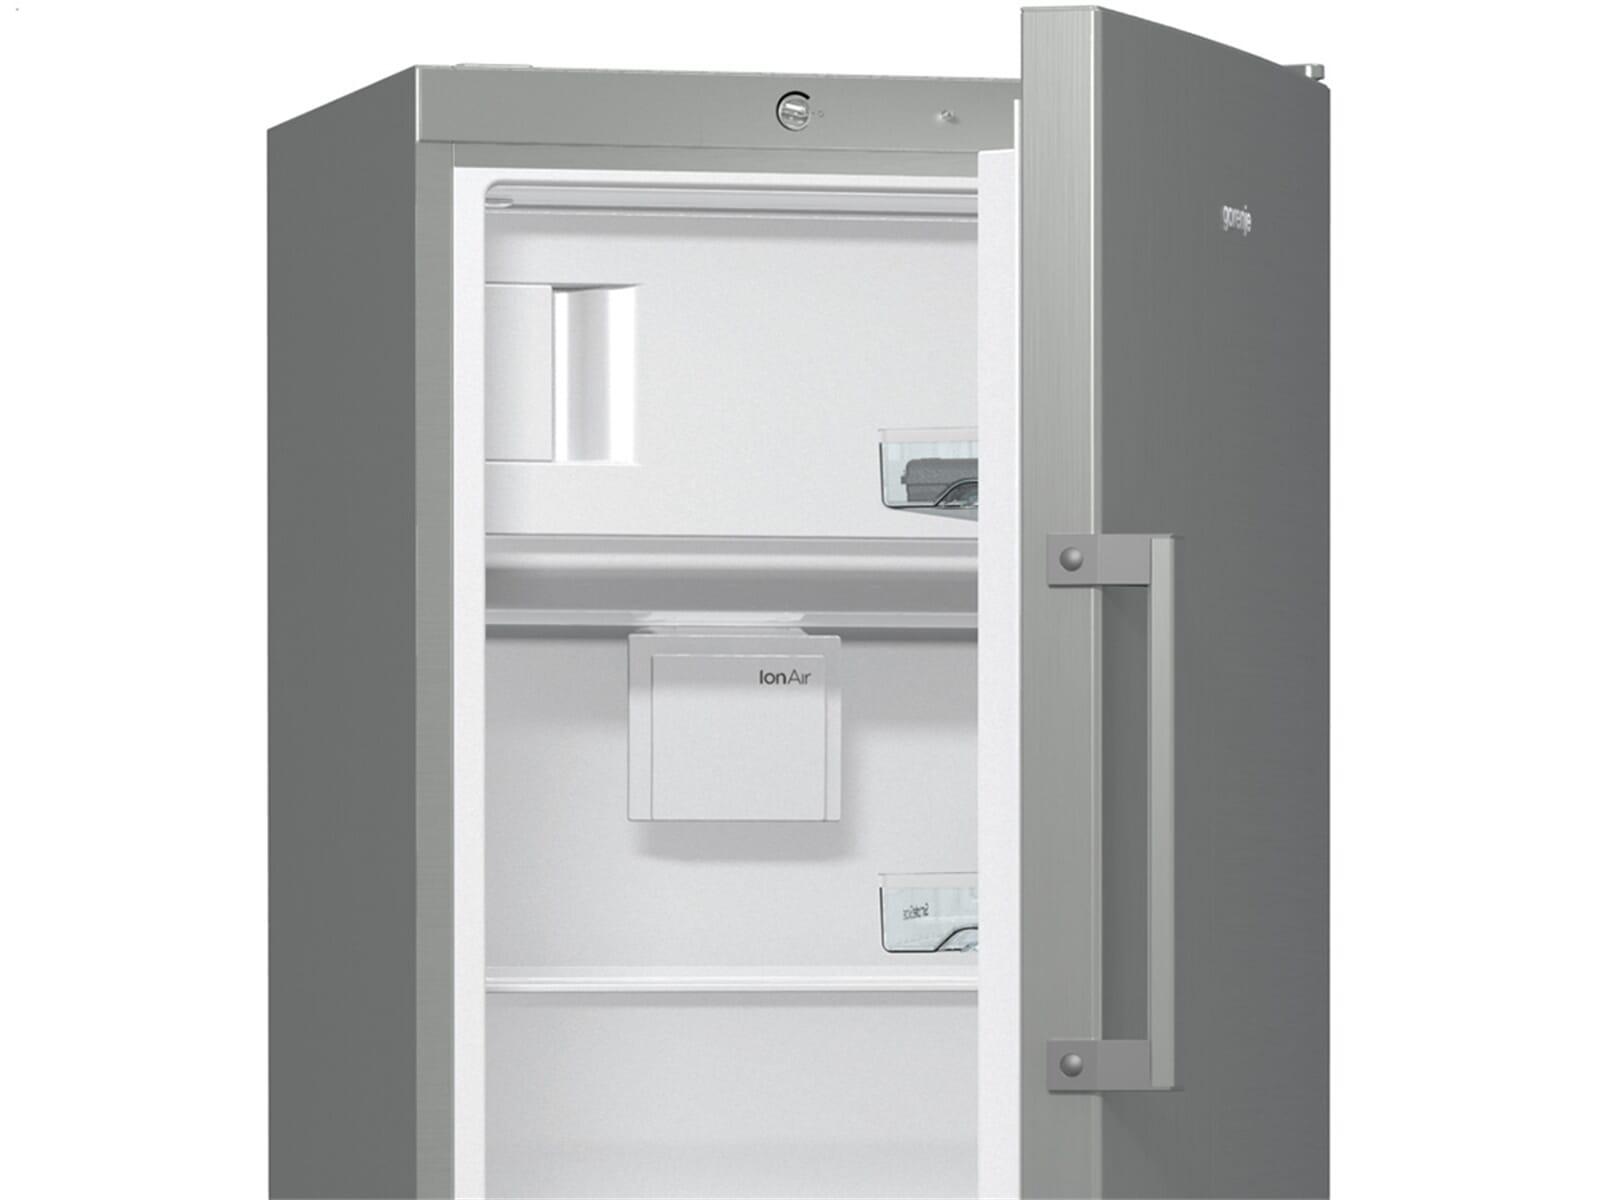 Retro Kühlschrank Dunkelrot : Gorenje rb bx standkühlschrank grau metallic